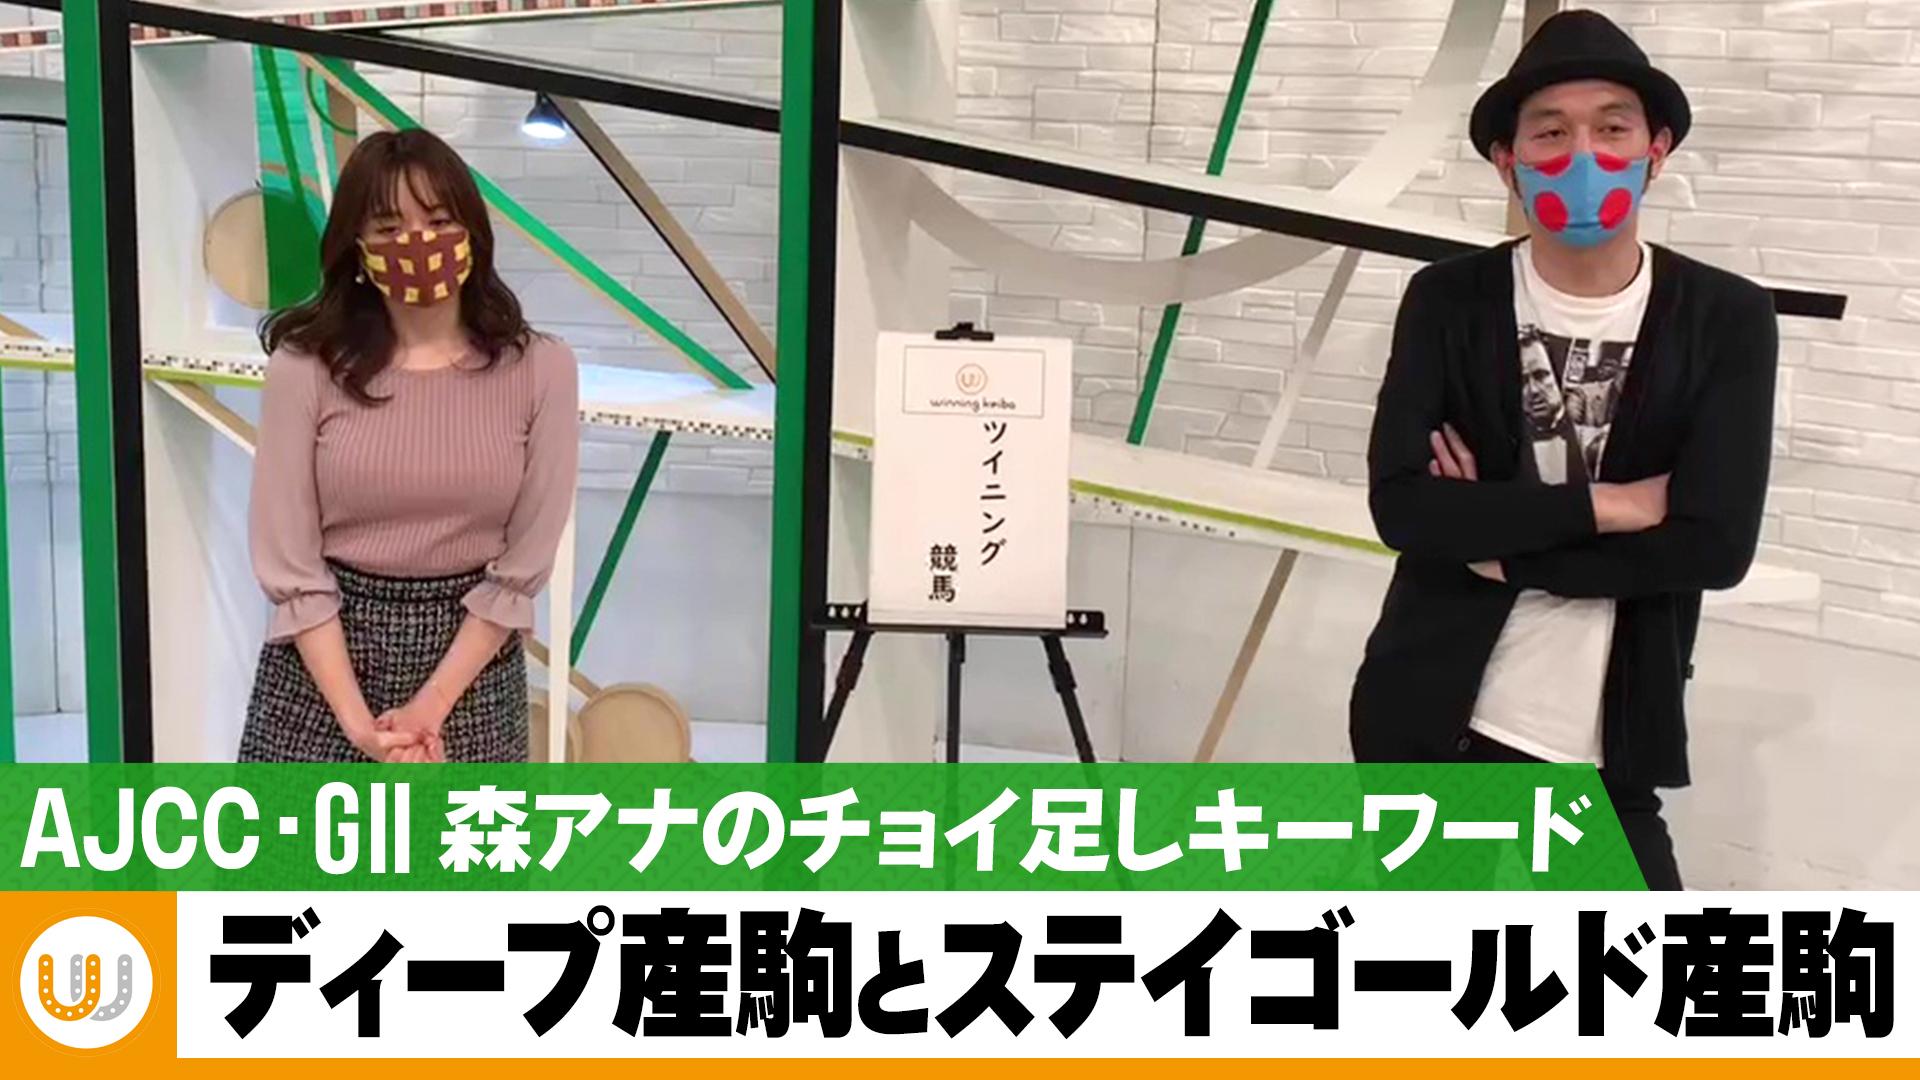 【AJCC】森香澄アナのチョイ足しキーワード『ディープ産駒とステイゴールド産駒』 ウイニング競馬 反省会